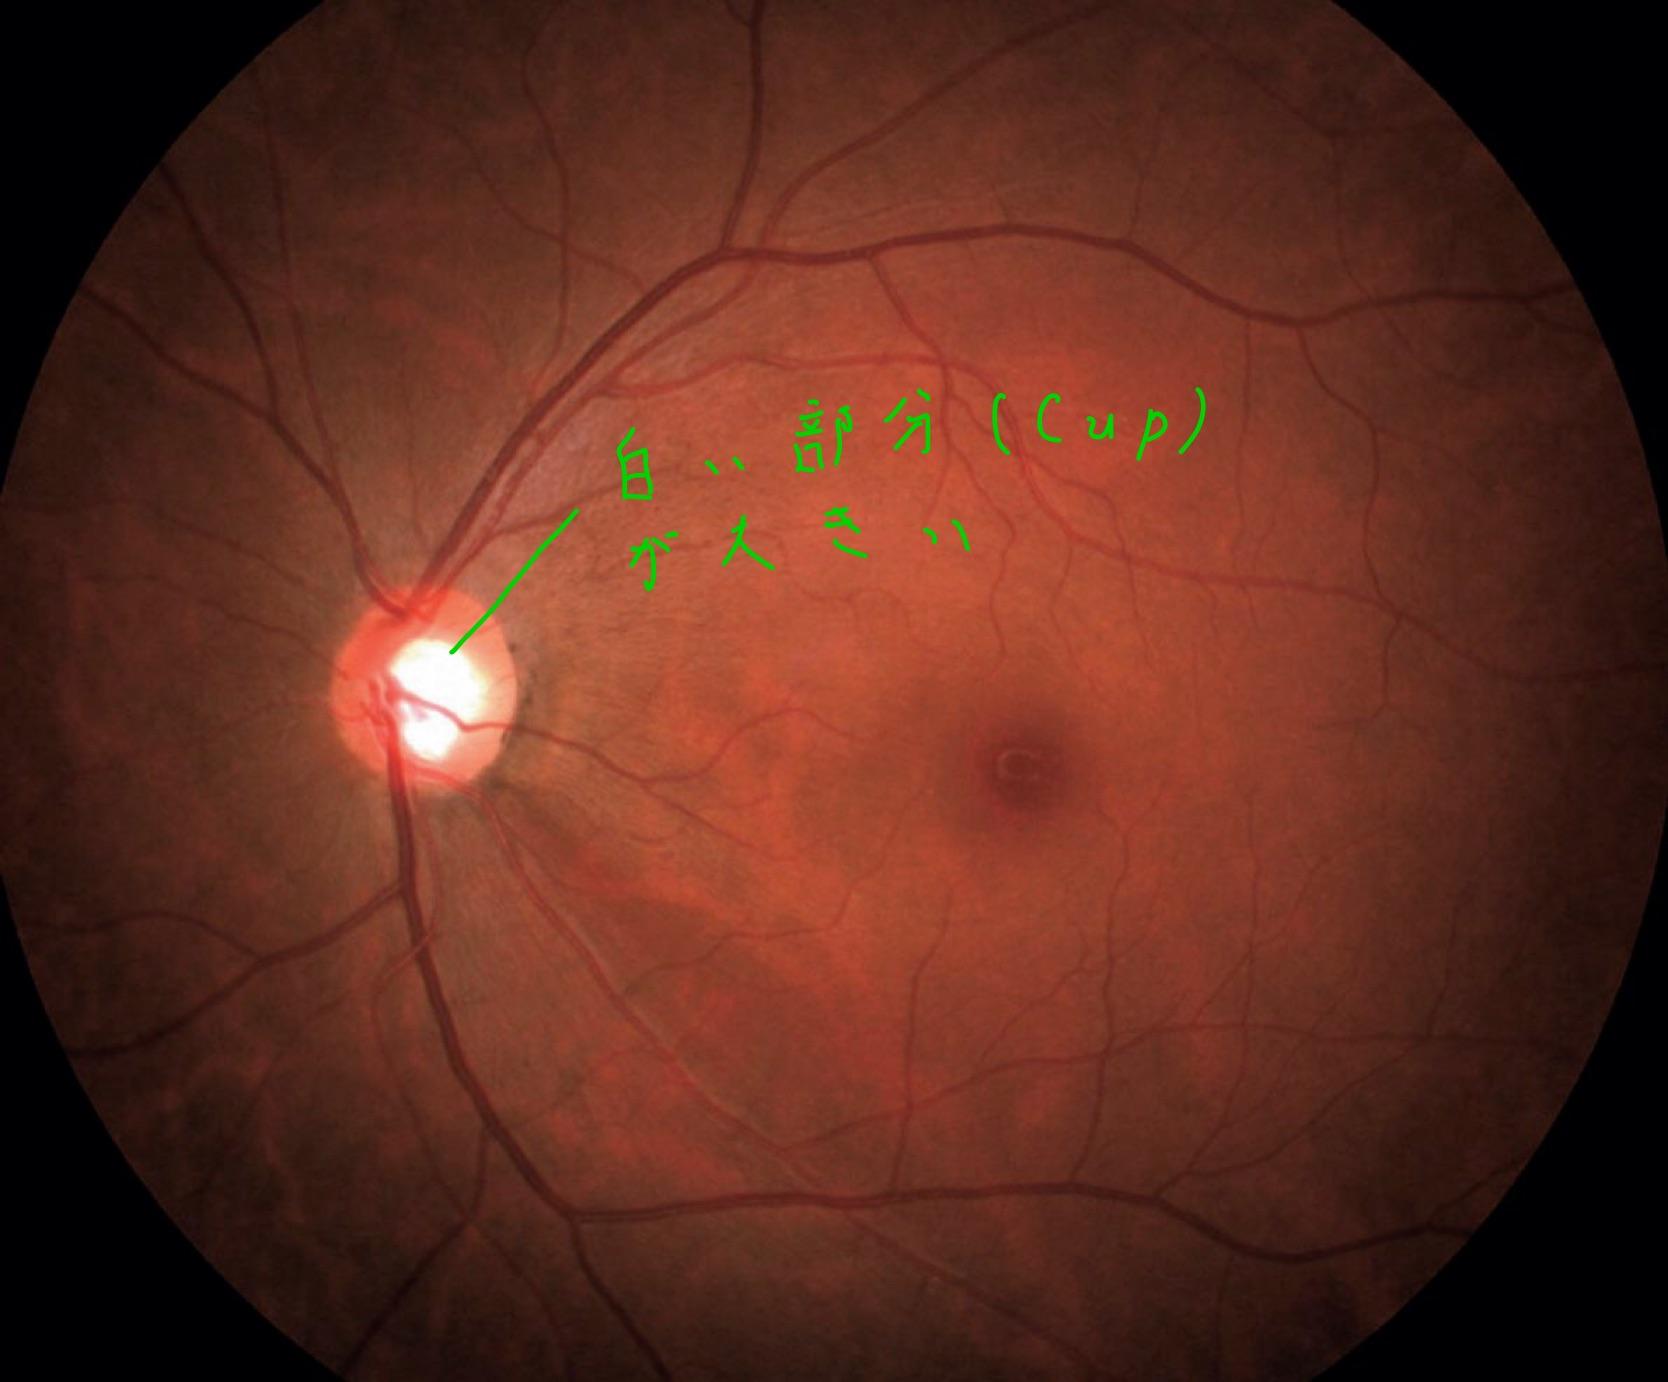 医師国家試験107A55_画像A_緑内障の眼底写真_Cupの拡大